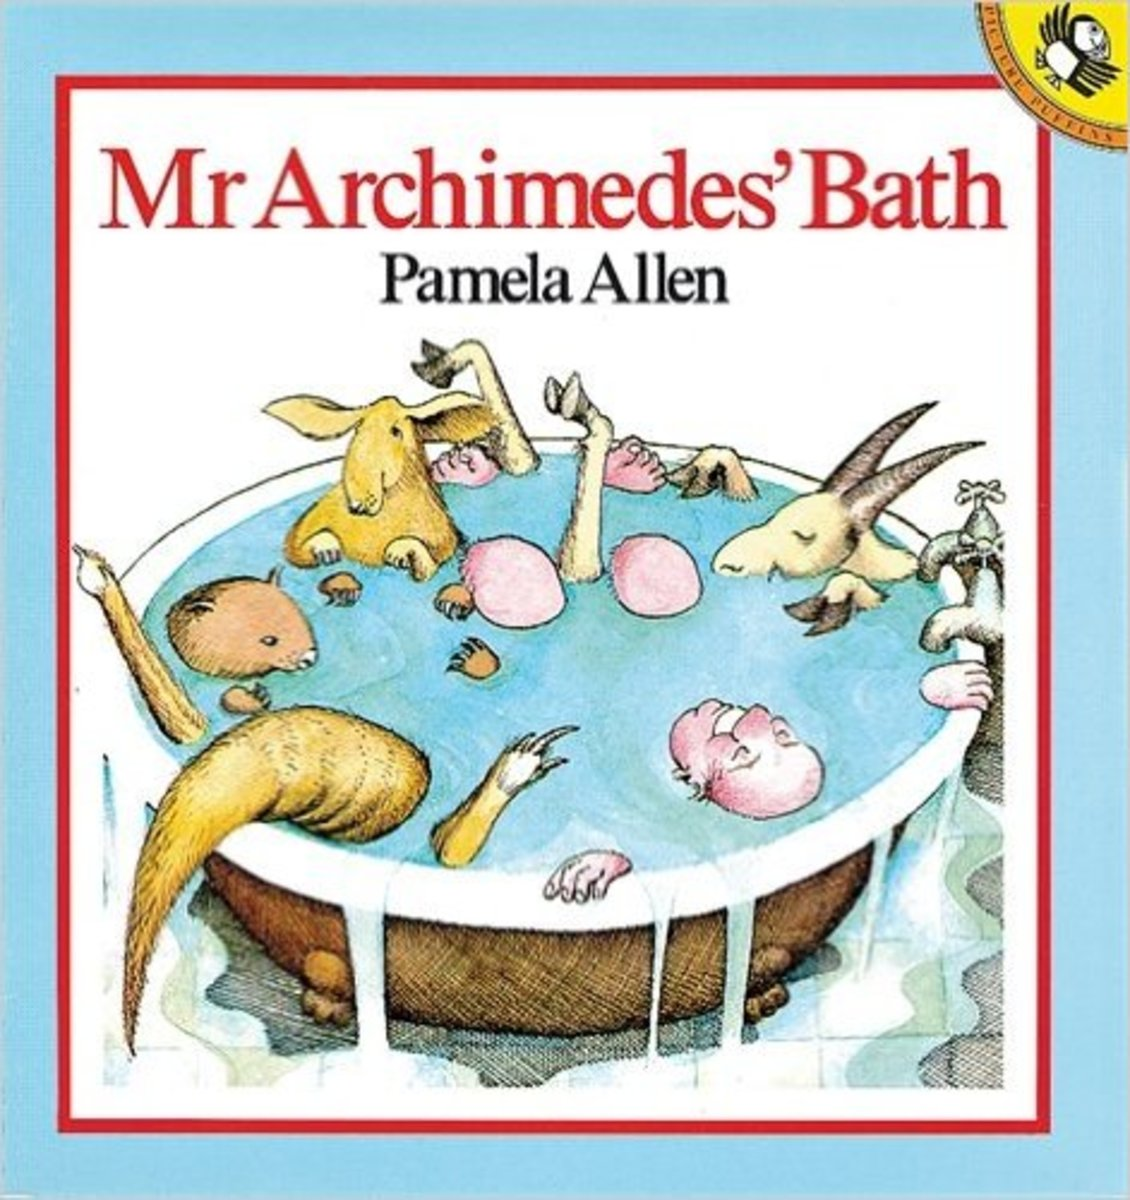 Mr. Archimedes' Bath by Pamela Allen